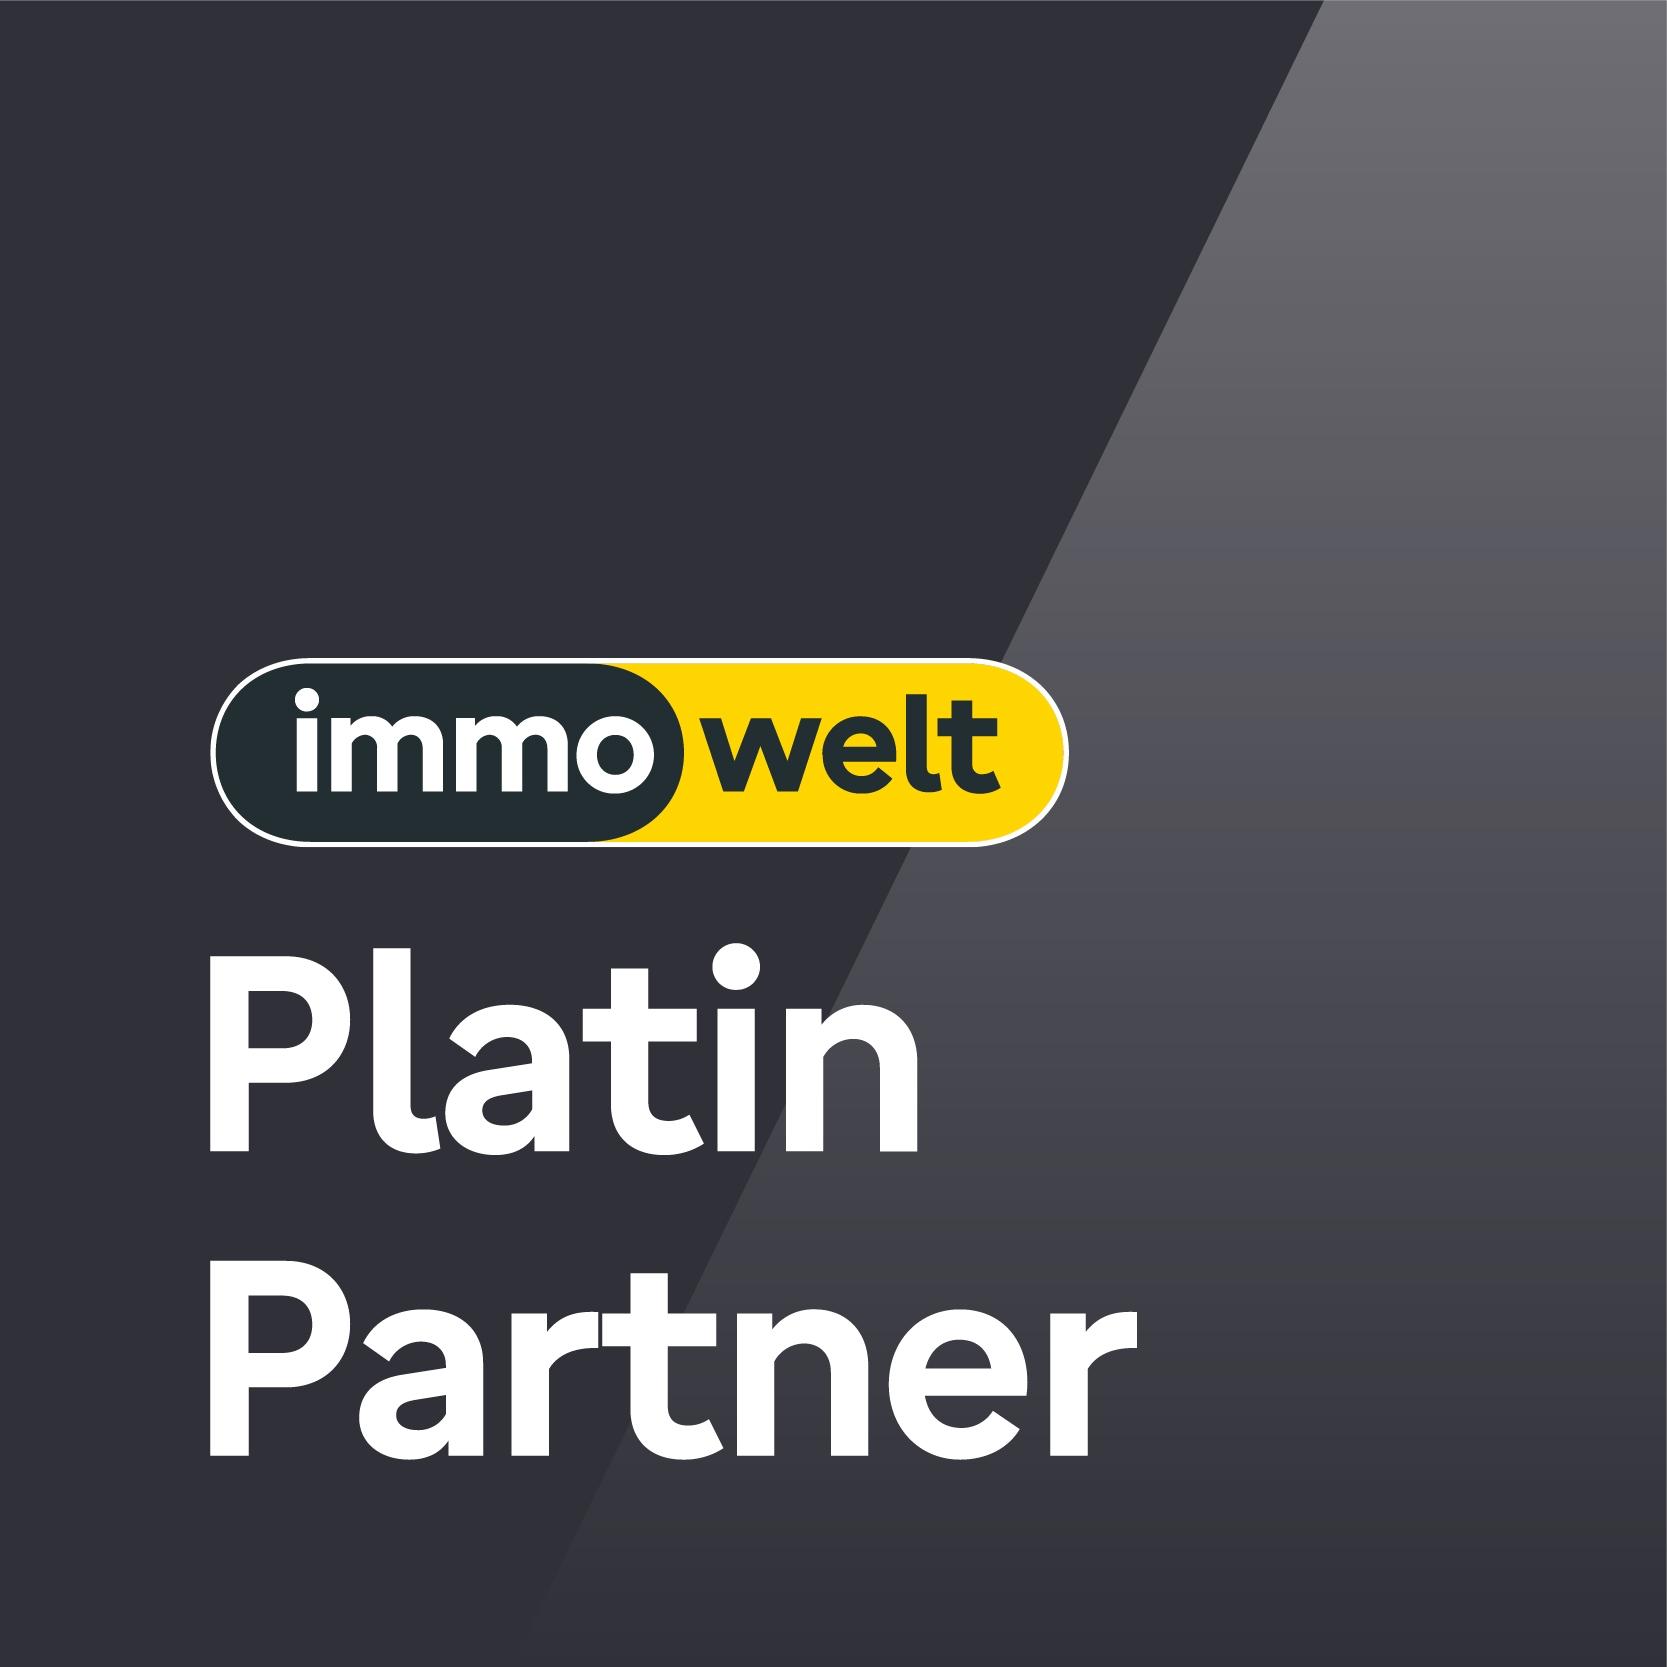 immowelt Platin Partner matt immobilien